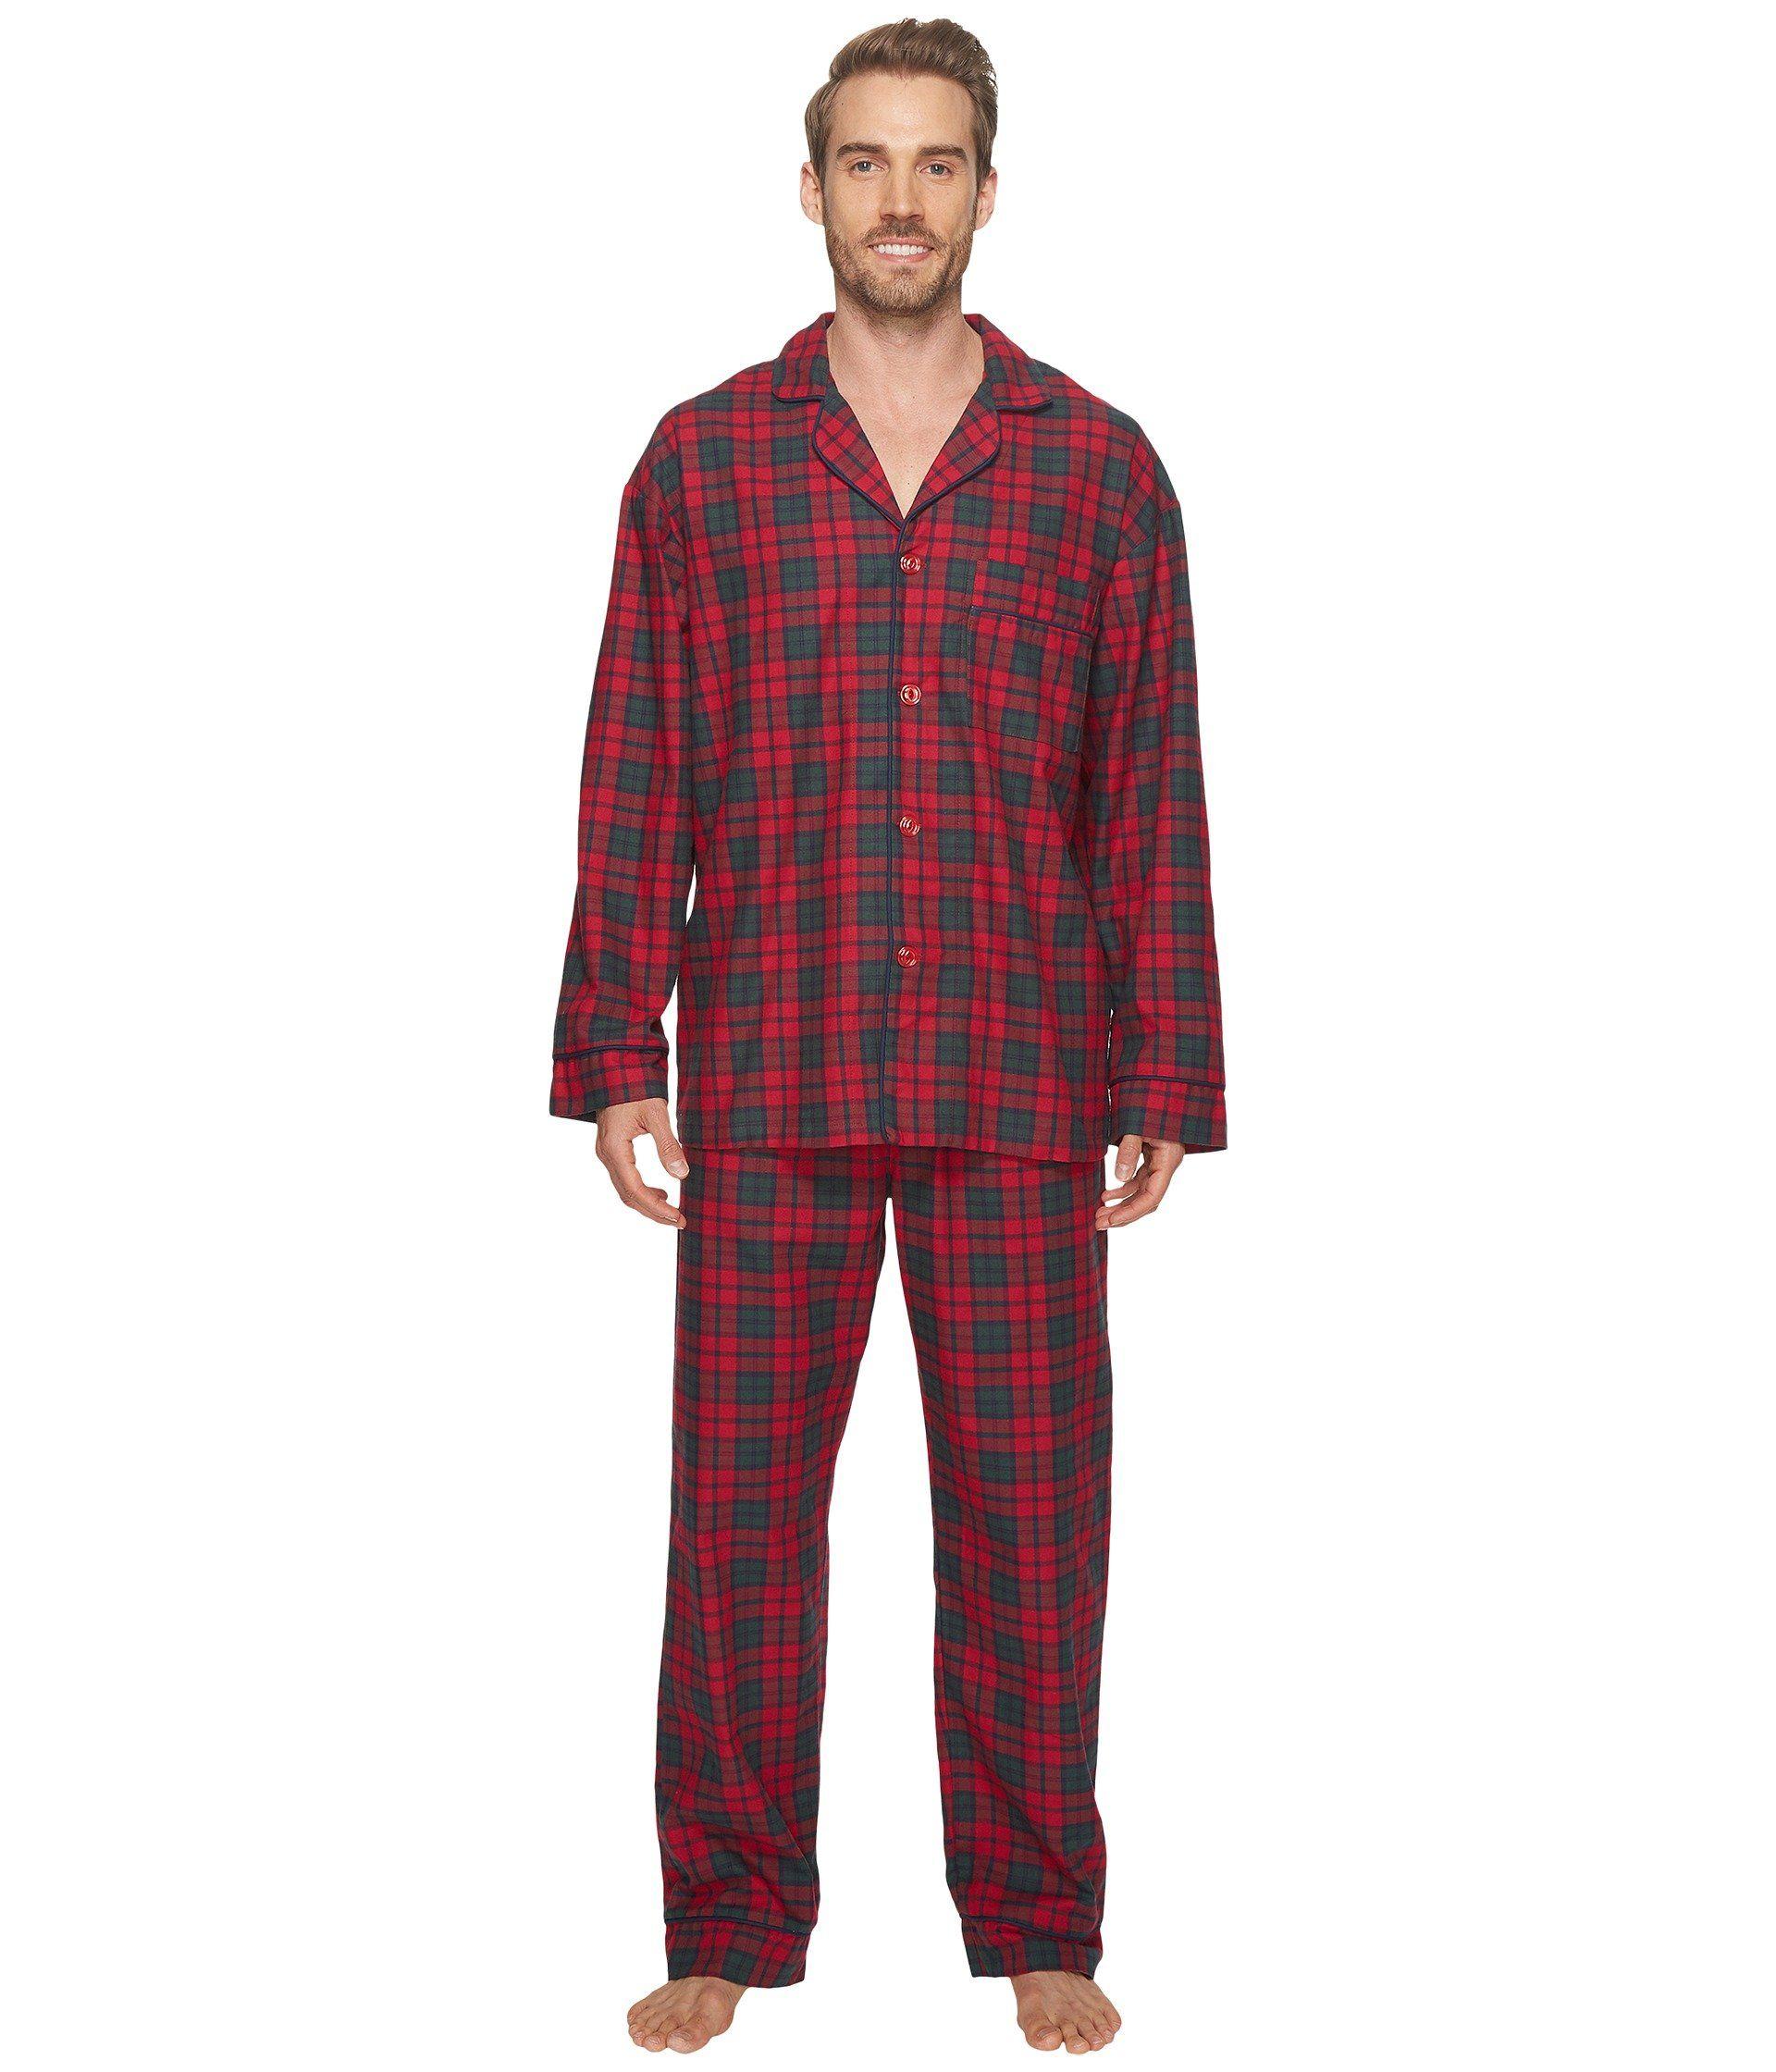 9e294f1b4b BEDHEAD Long Sleeve Classic Pajama Set.  bedhead  cloth